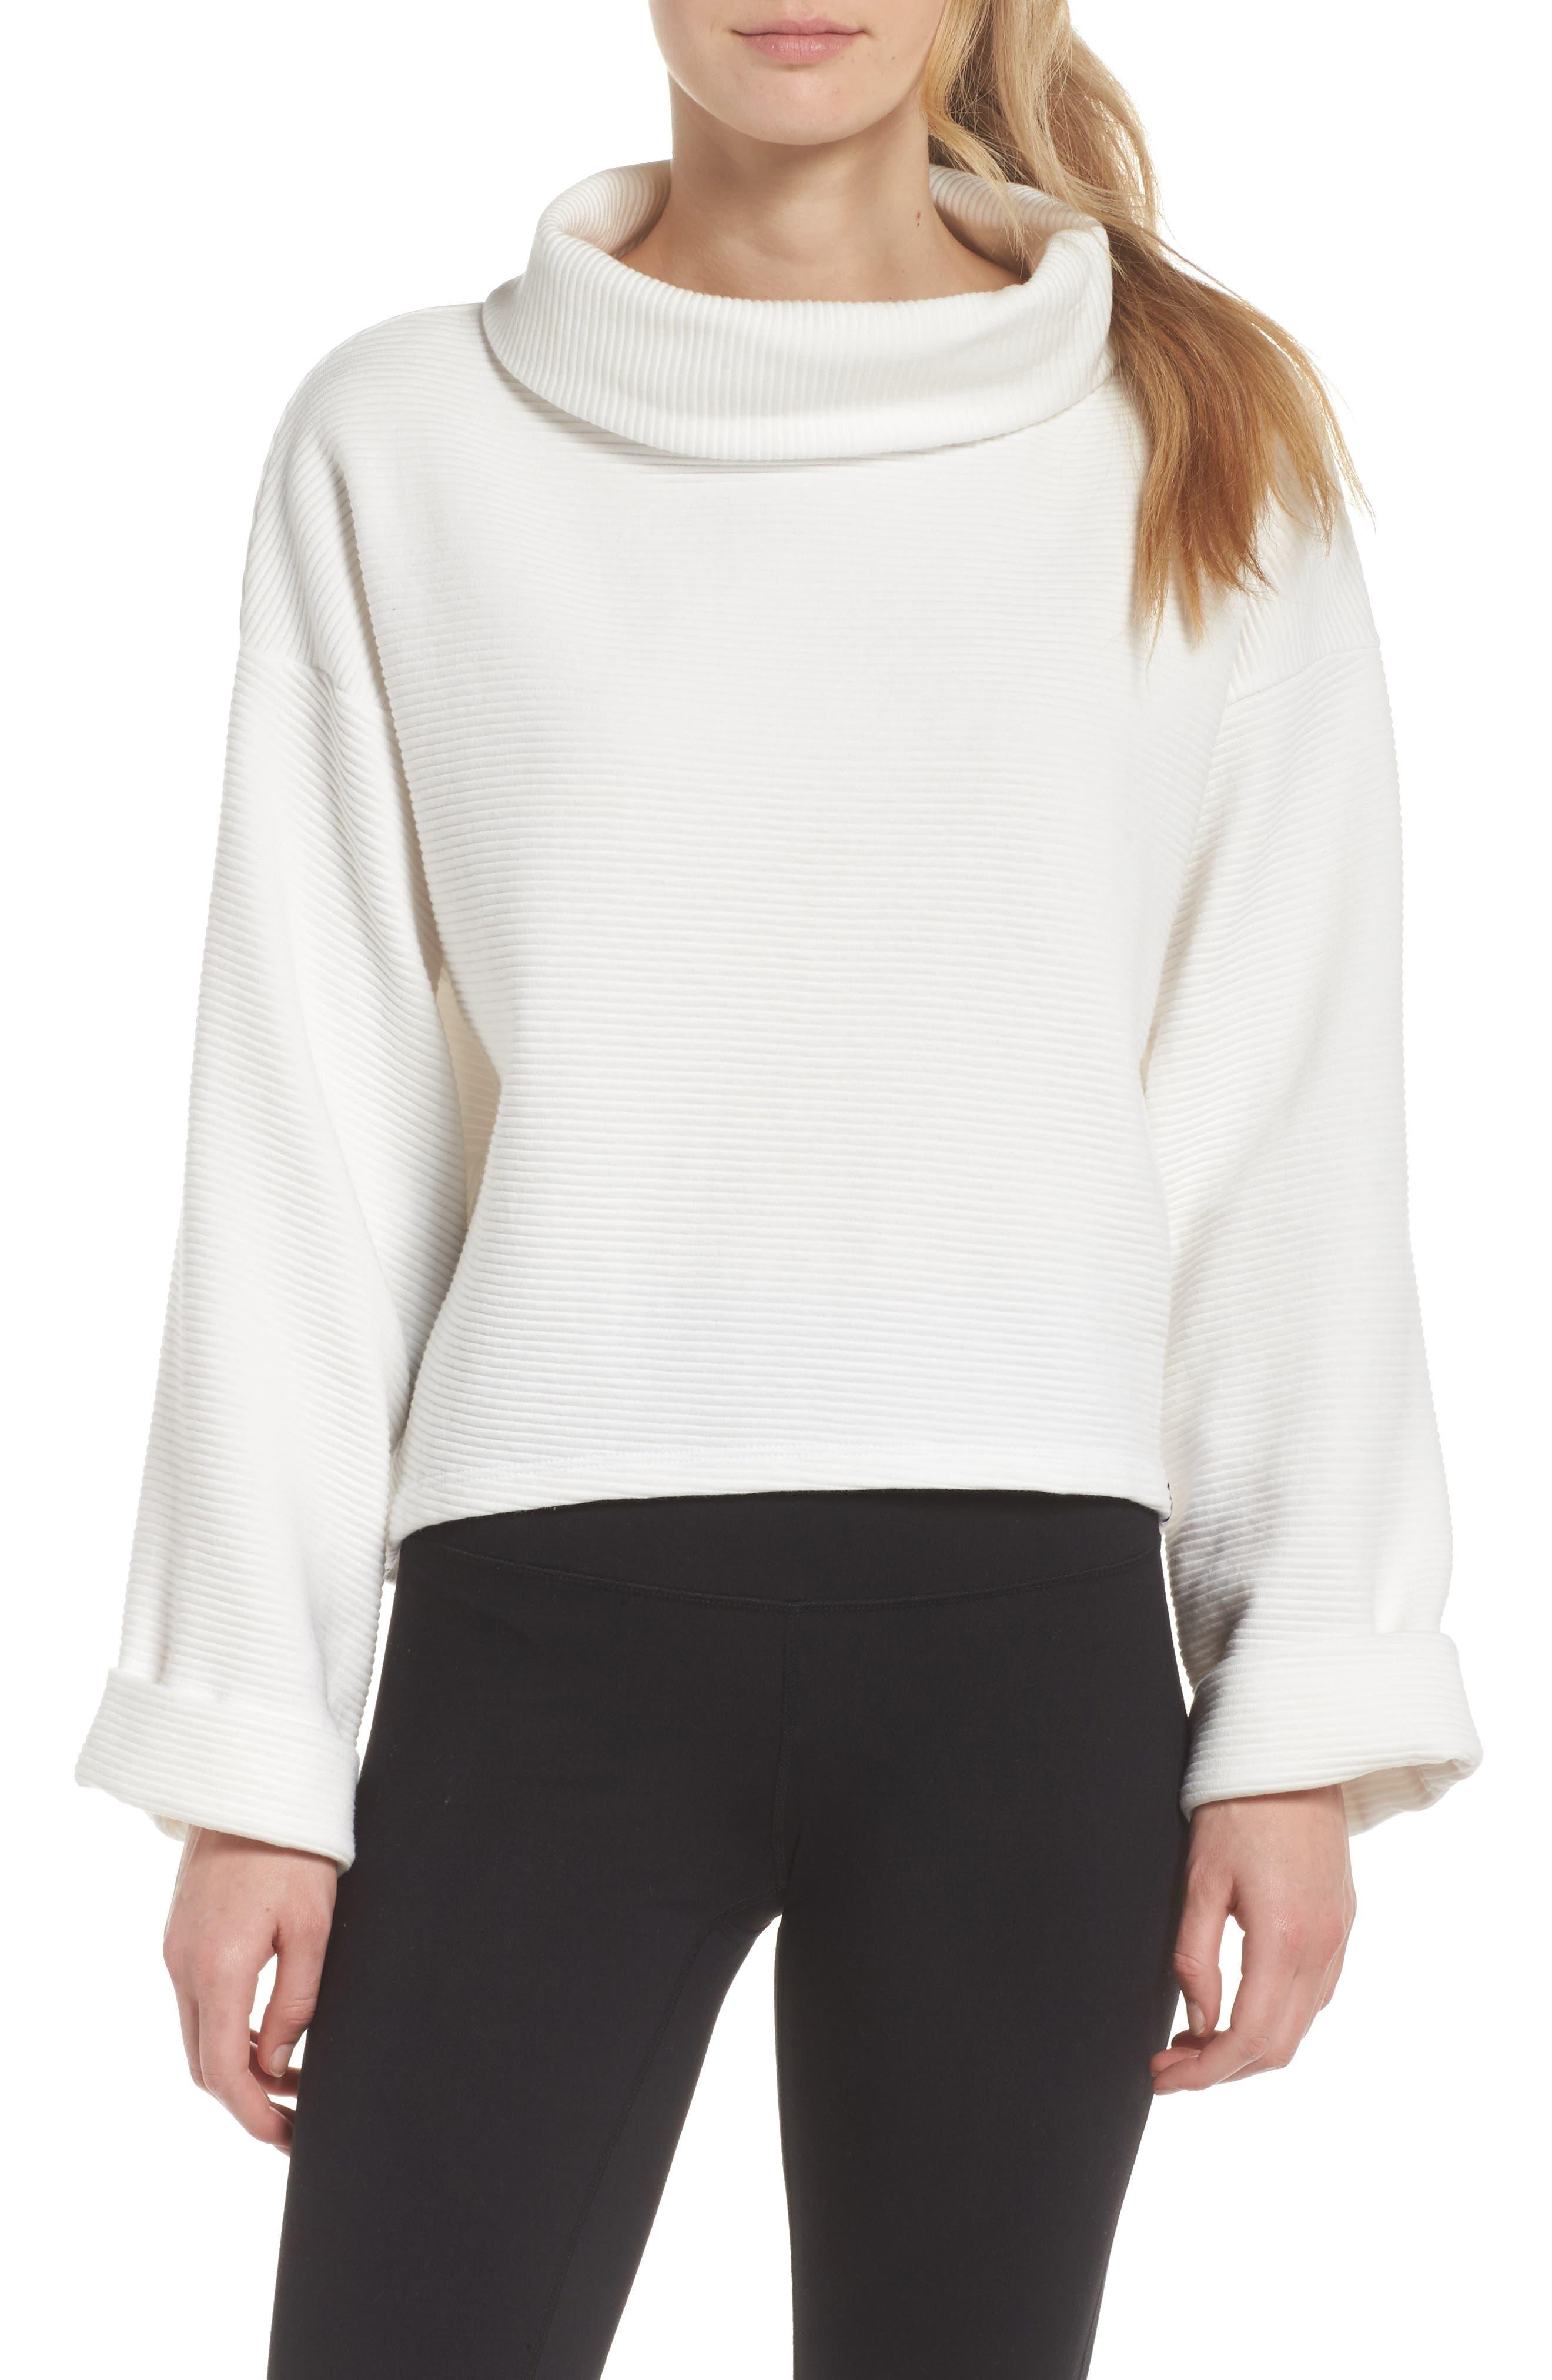 Whittier Sweatshirt,                             Main thumbnail 1, color,                             100